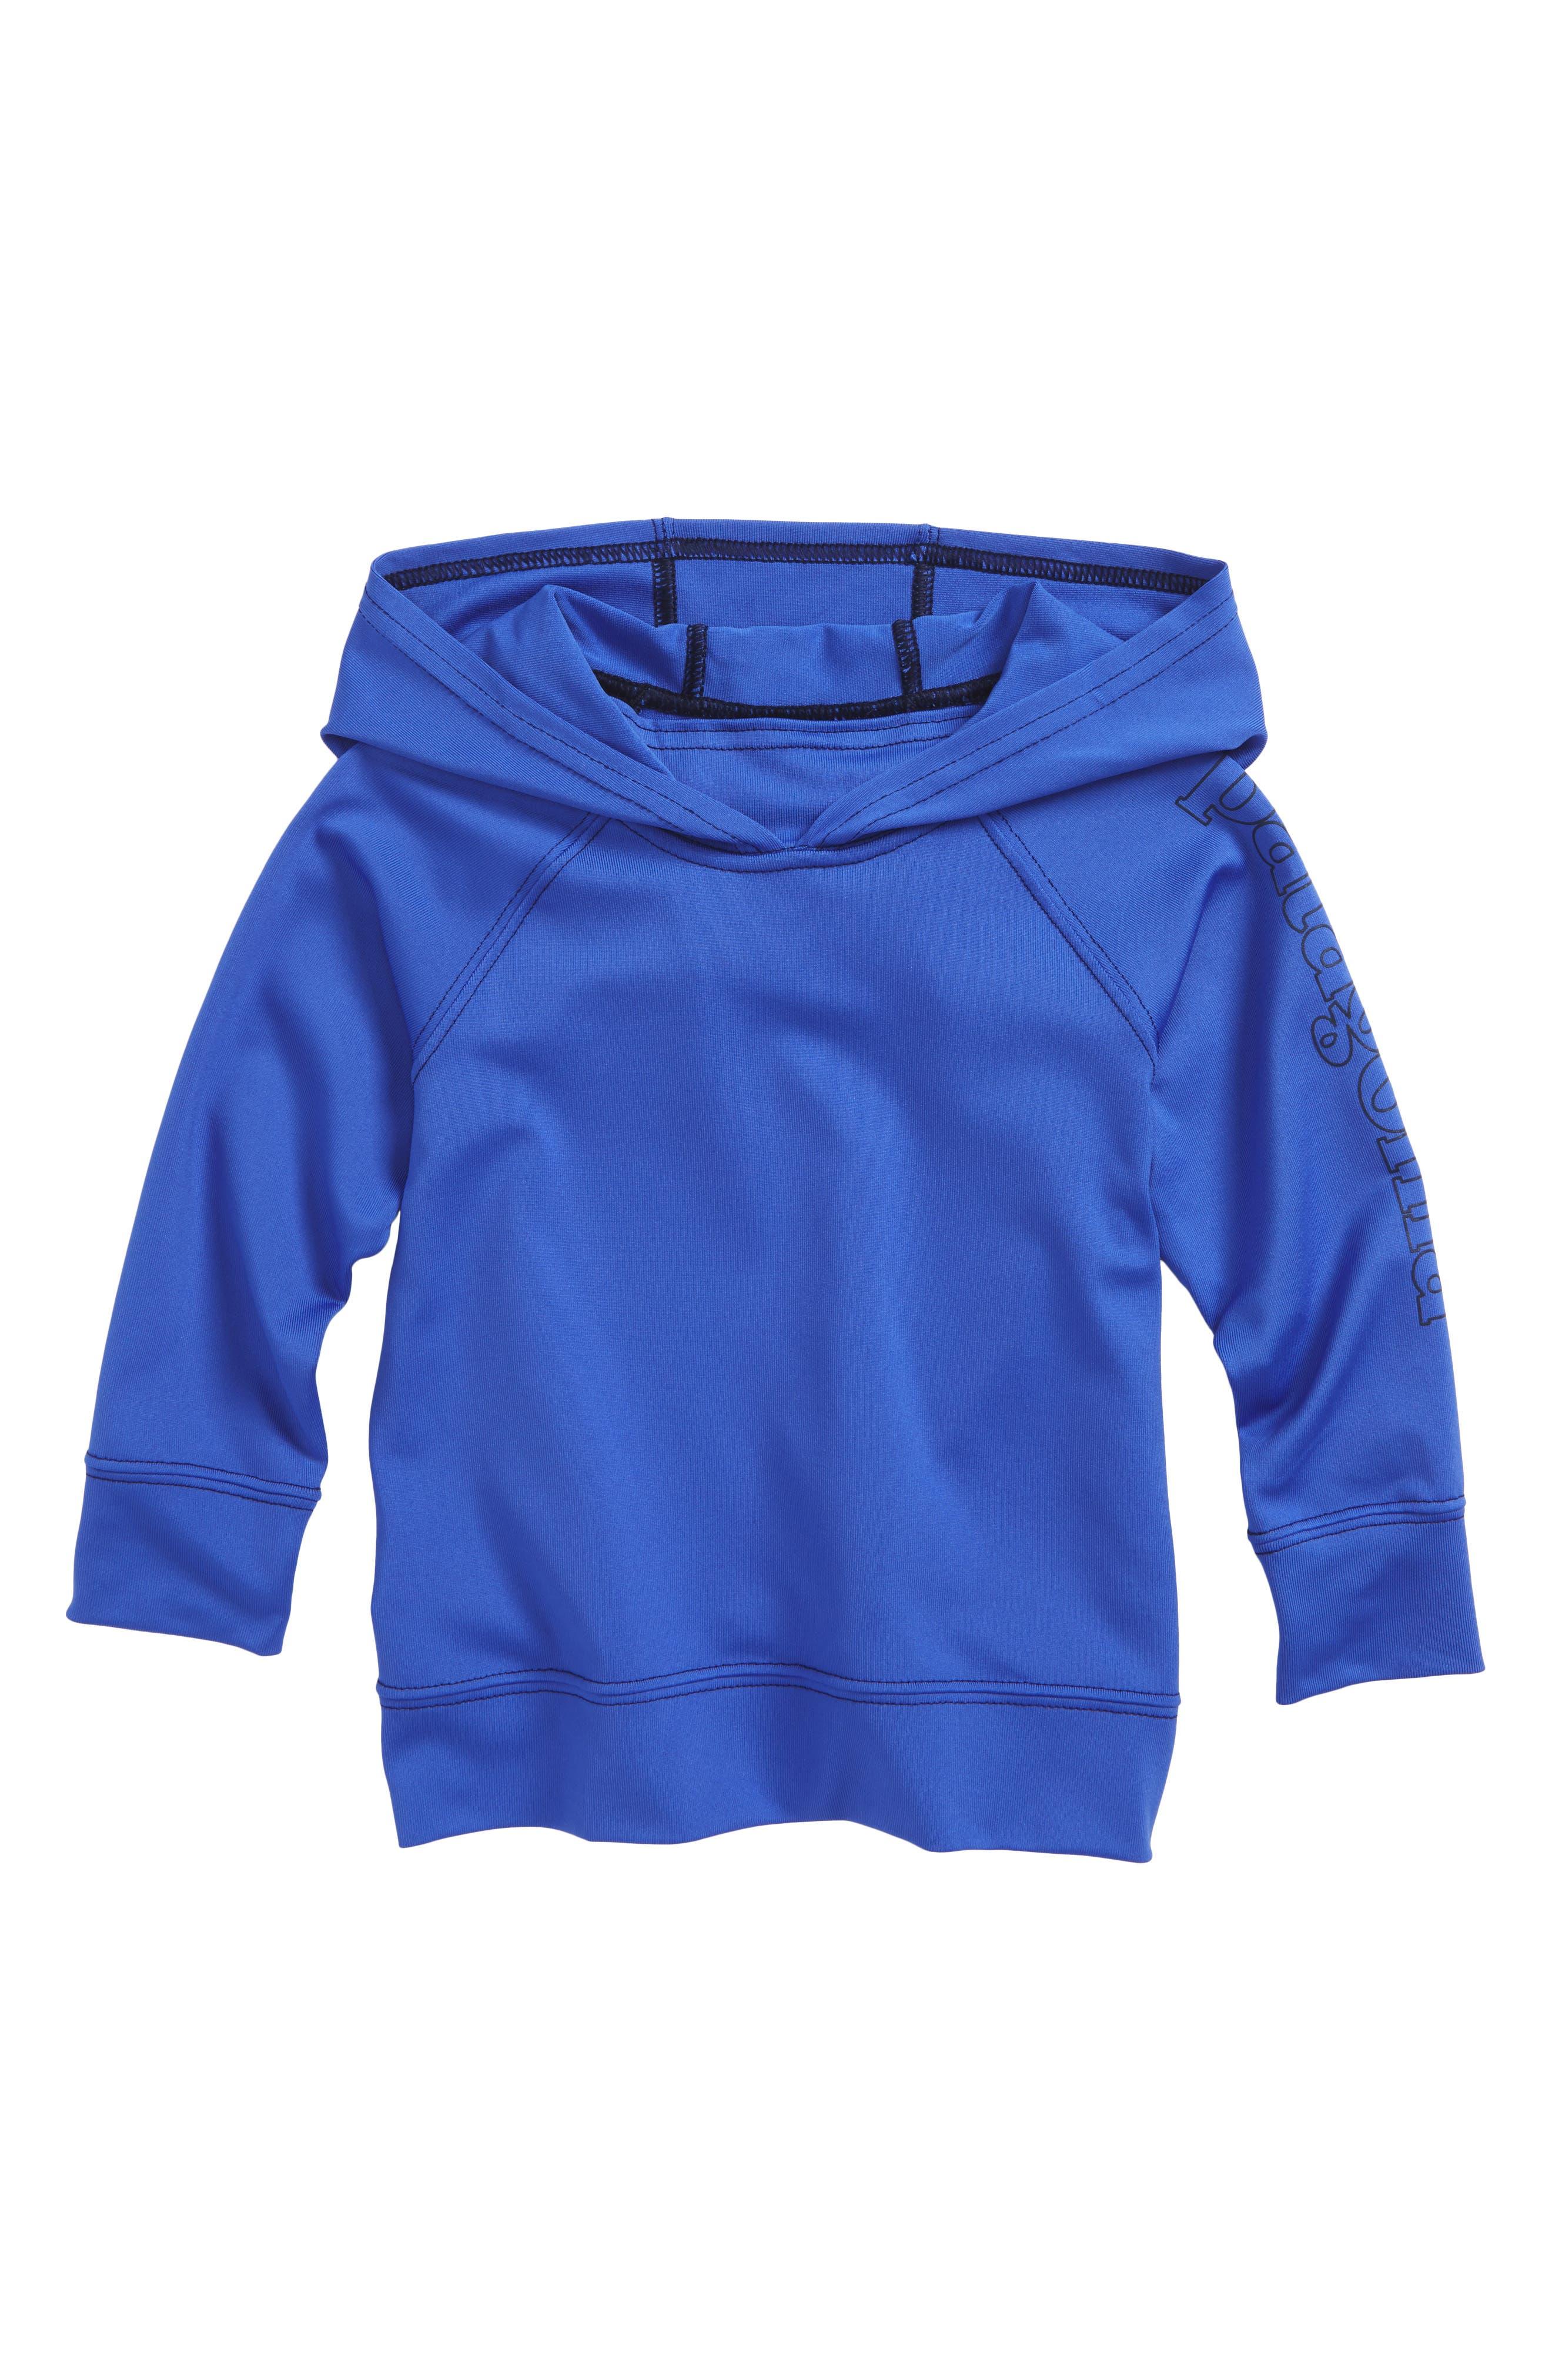 Capilene<sup>®</sup> Sun Hoodie,                         Main,                         color, Imb Imperial Blue